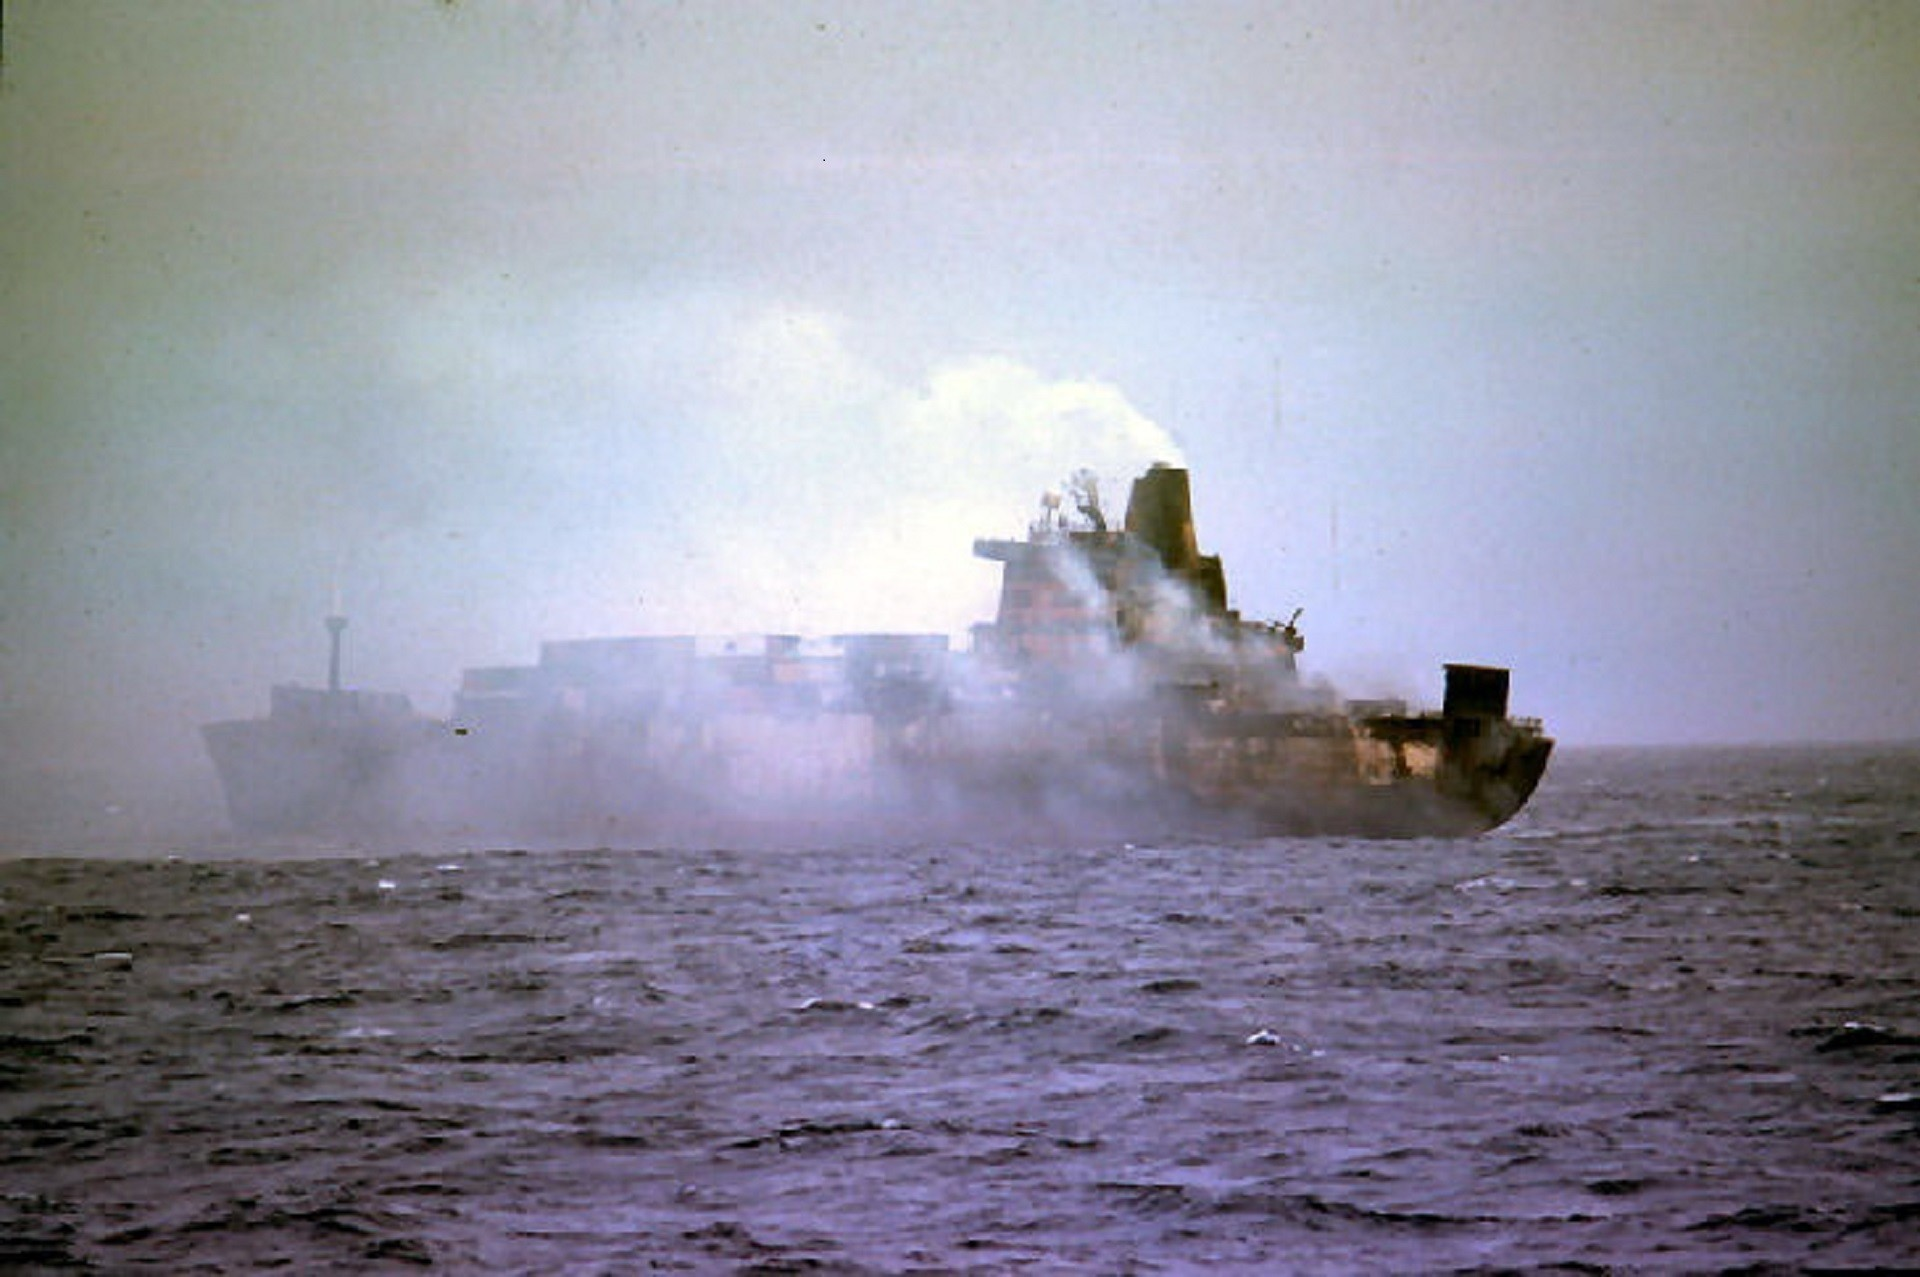 Atlantic Conveyor, nakon što je pogođen raketama.